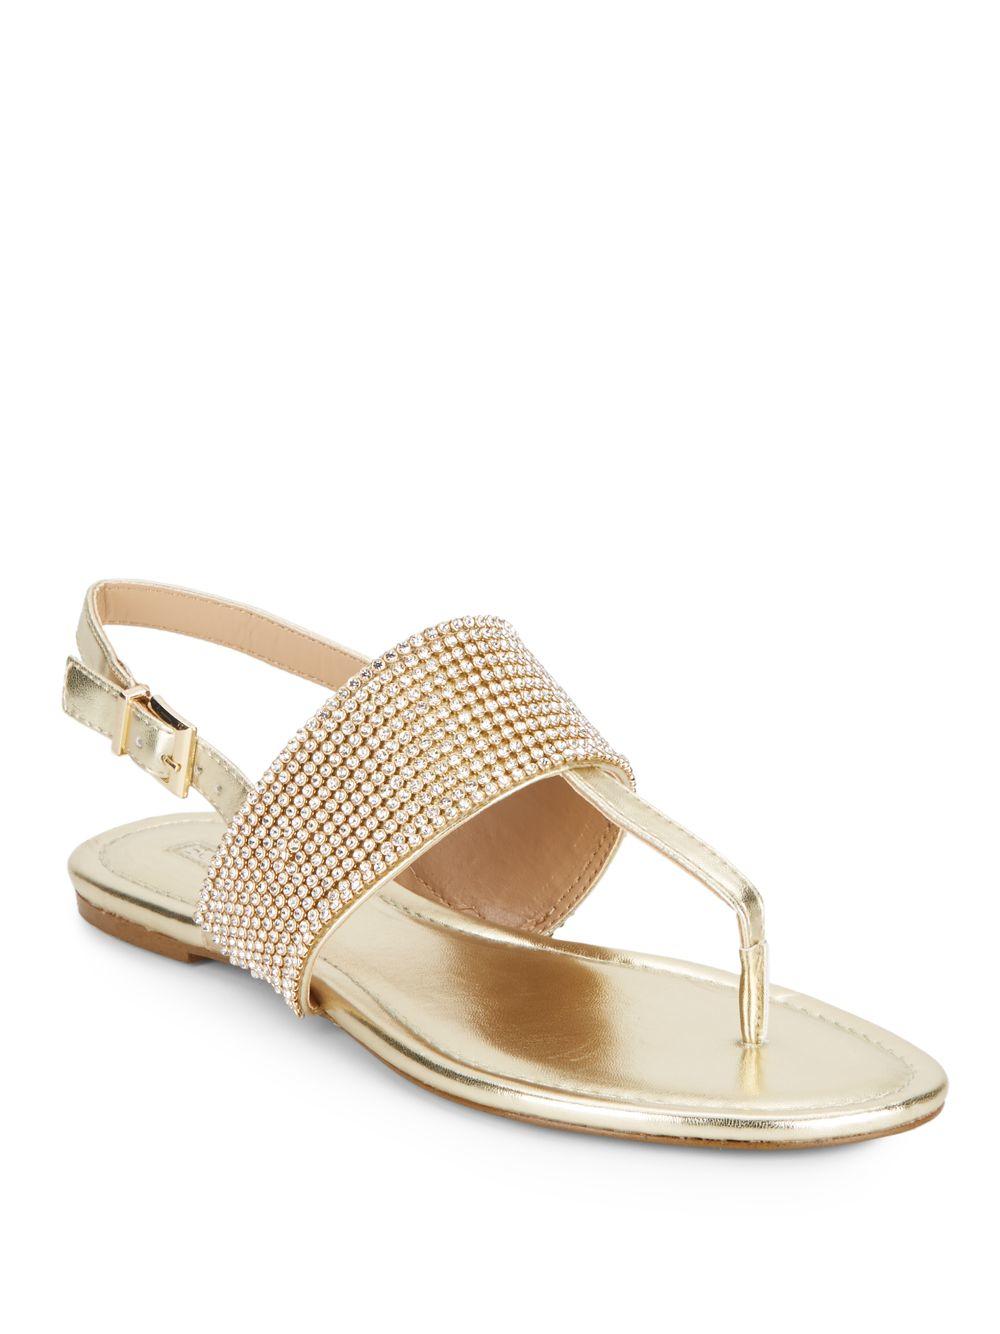 c4da2668d5caee Lyst - BCBGeneration Wander Metallic Thong Sandals in Metallic